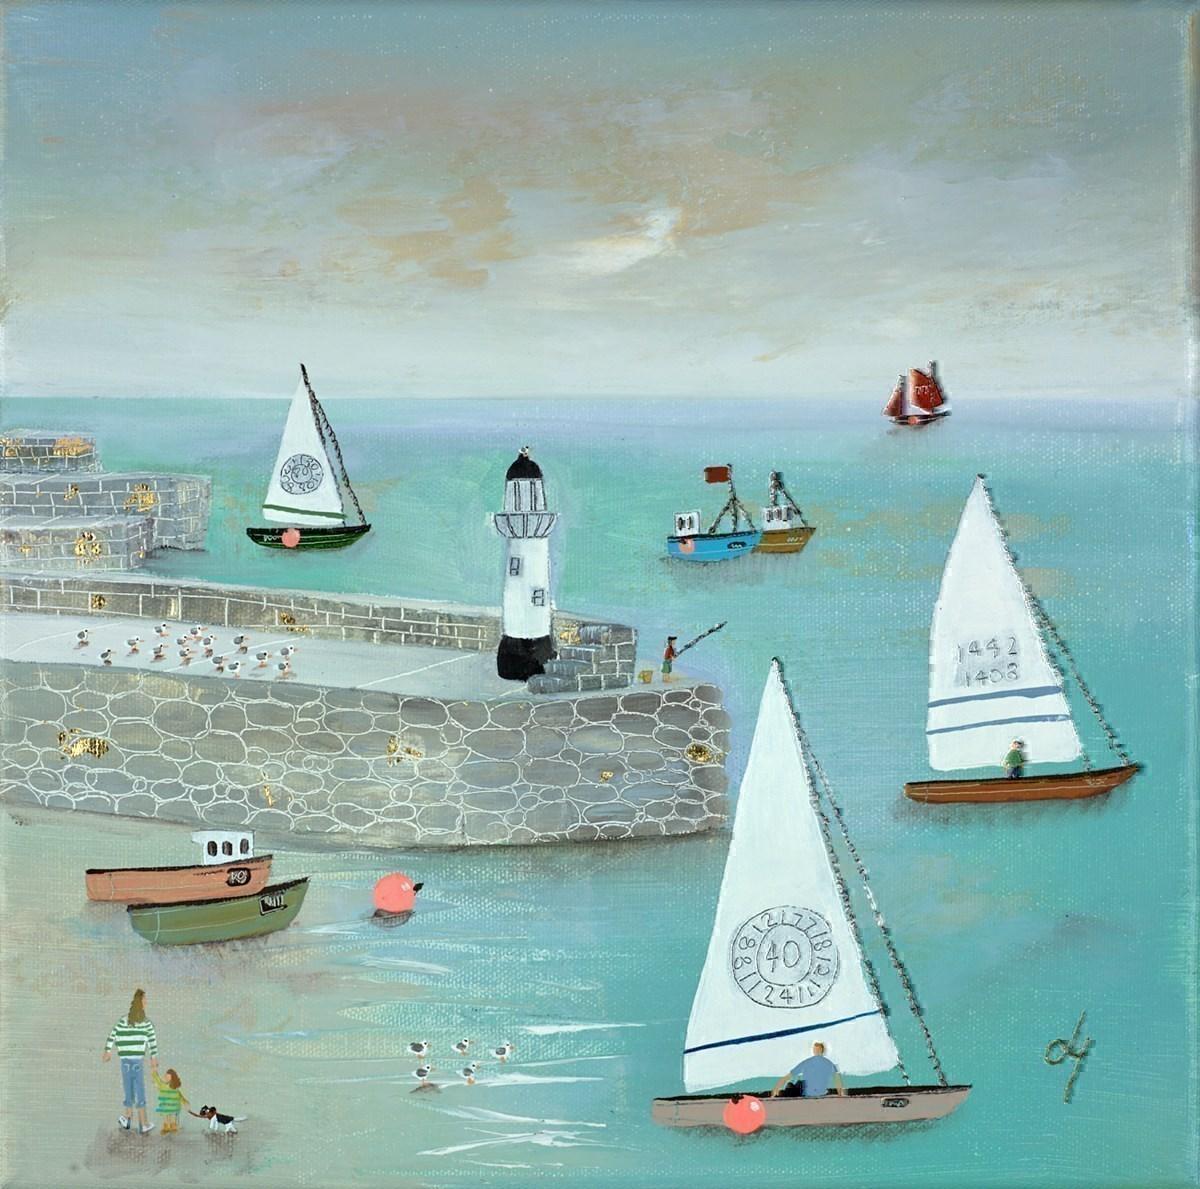 Lighthouse 'n' Sails